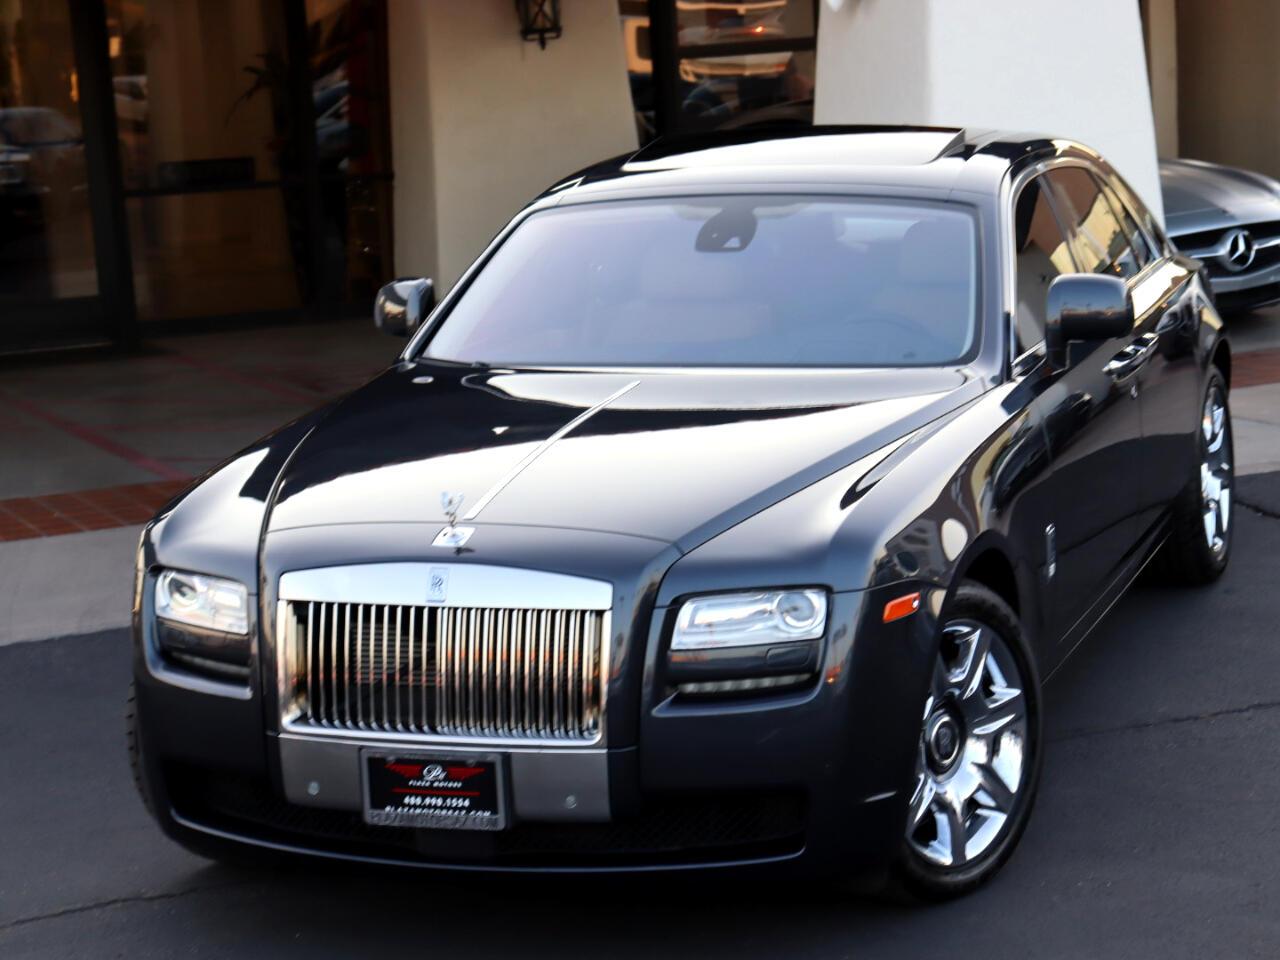 Rolls-Royce Ghost Sedan 2010